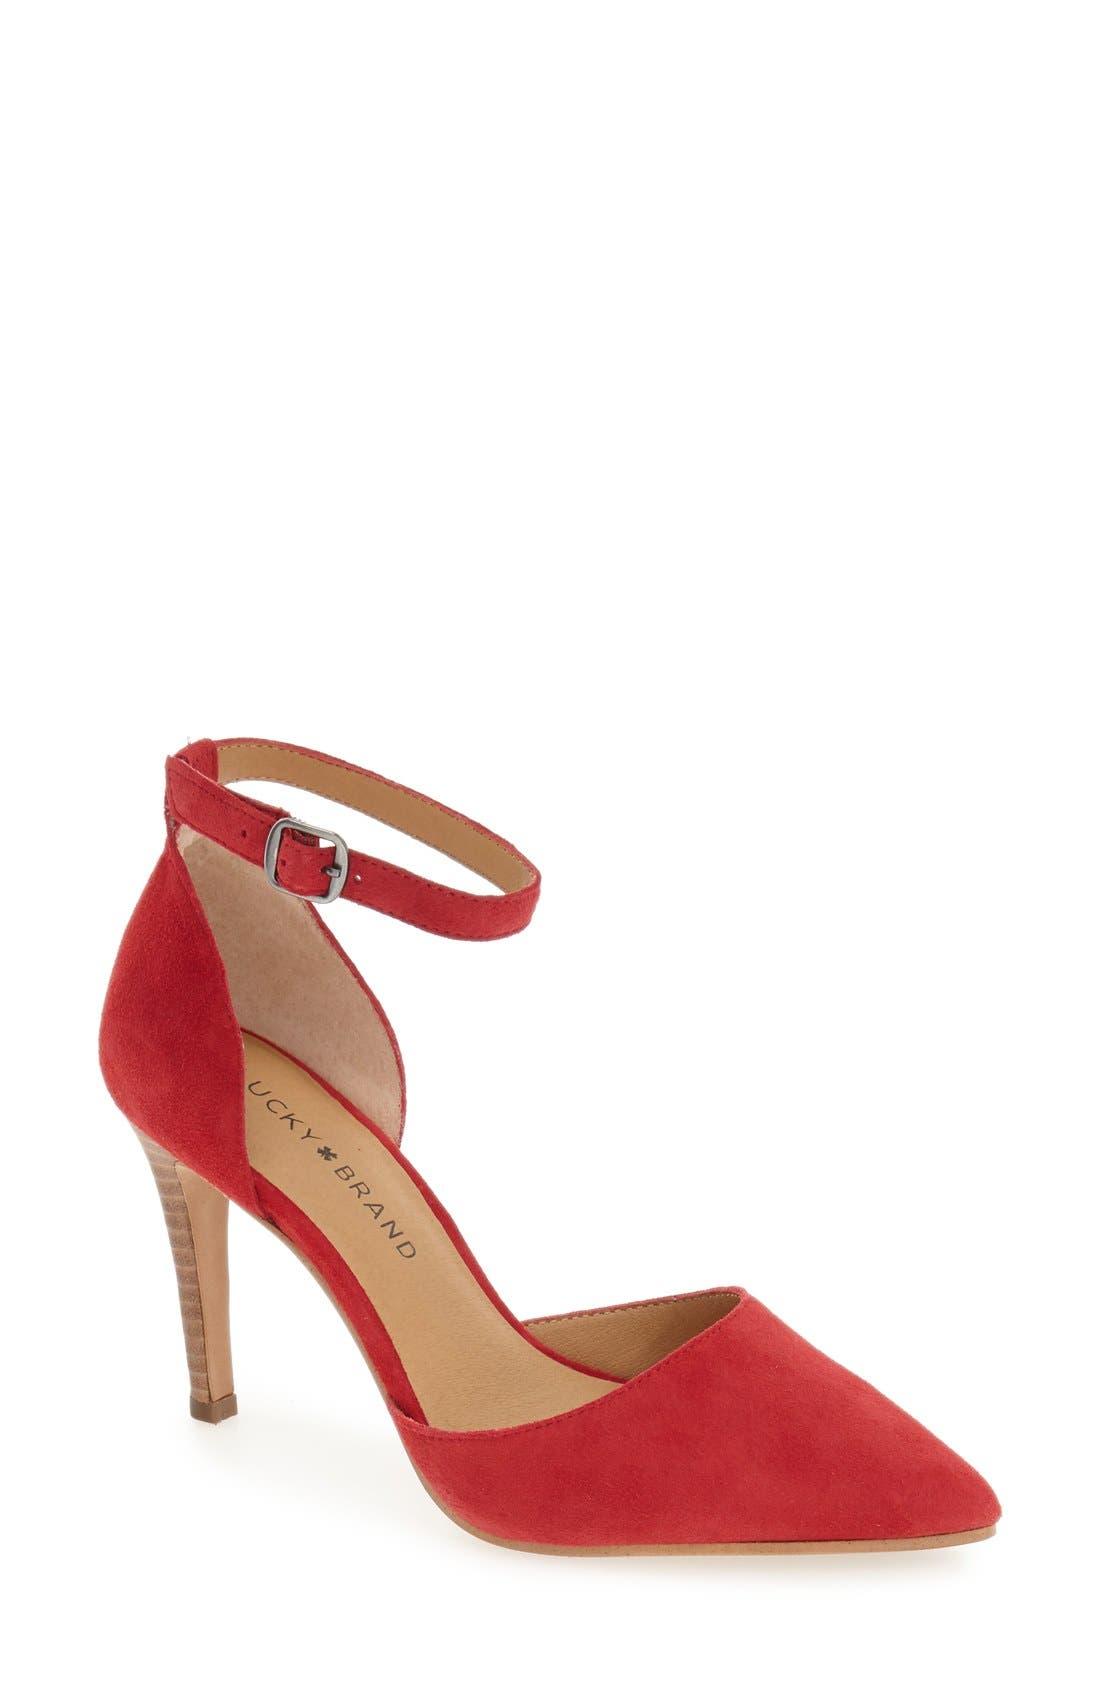 Alternate Image 1 Selected - Lucky Brand 'Tukko' d'Orsay Ankle Strap Pump (Women)